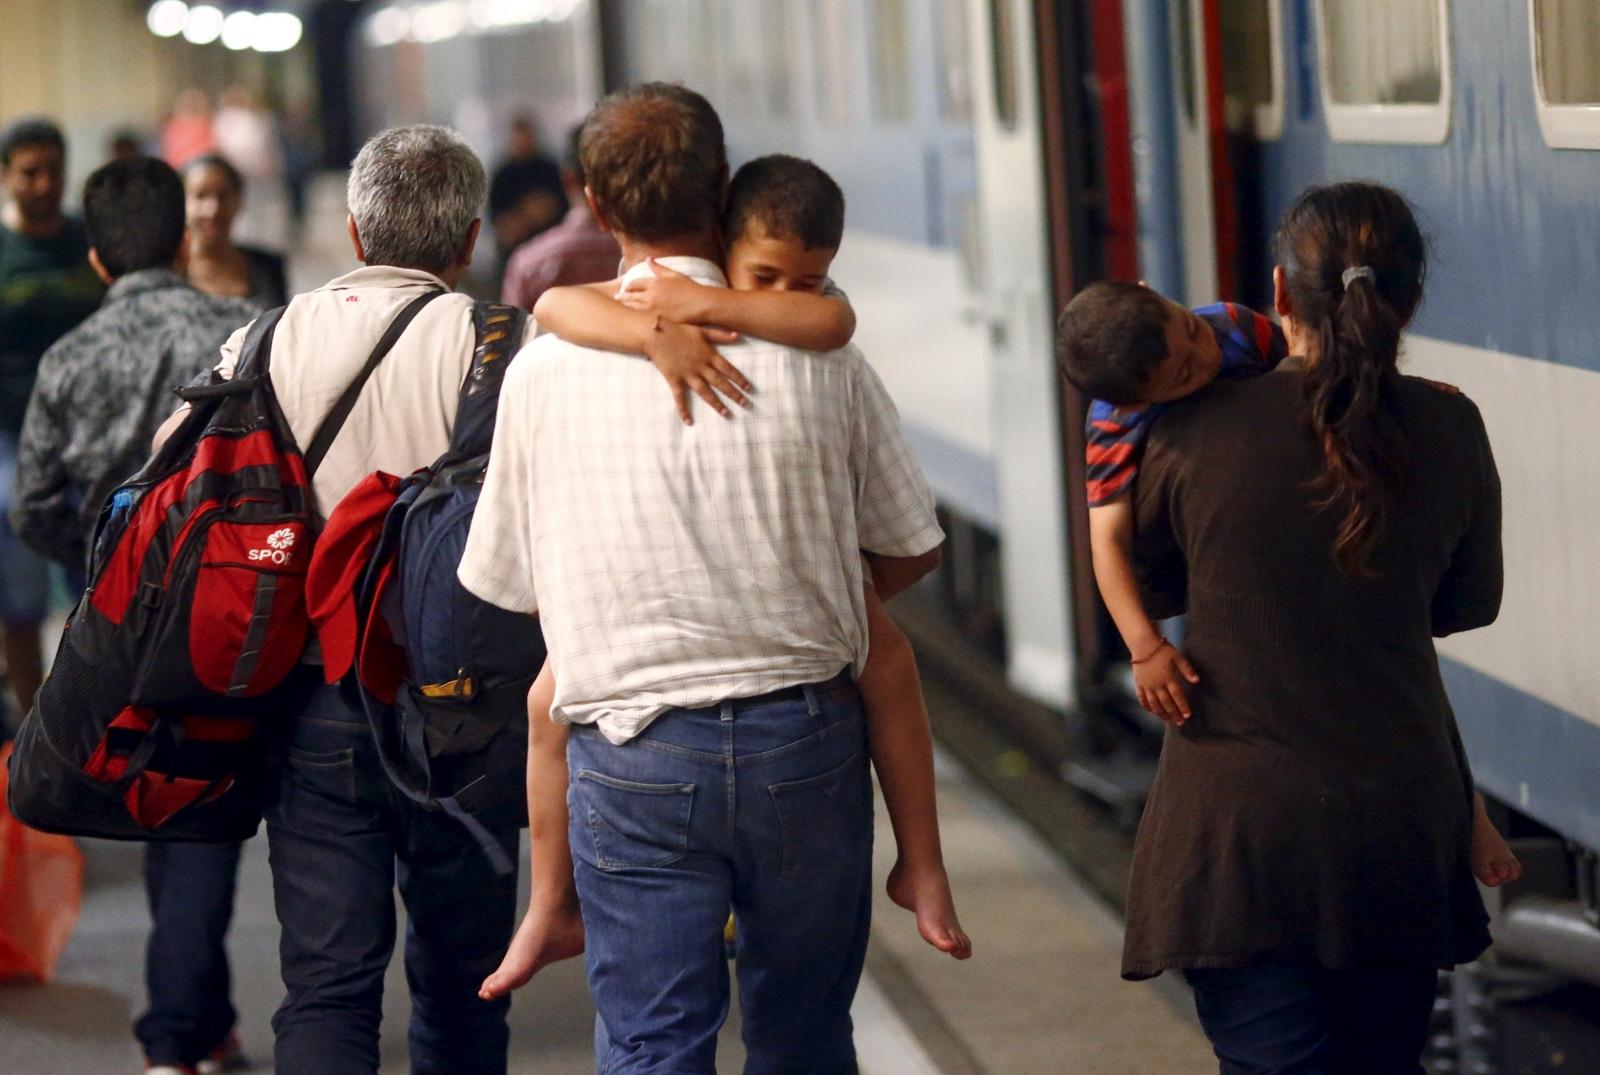 EU migrant crisis, trains arrive in Germany